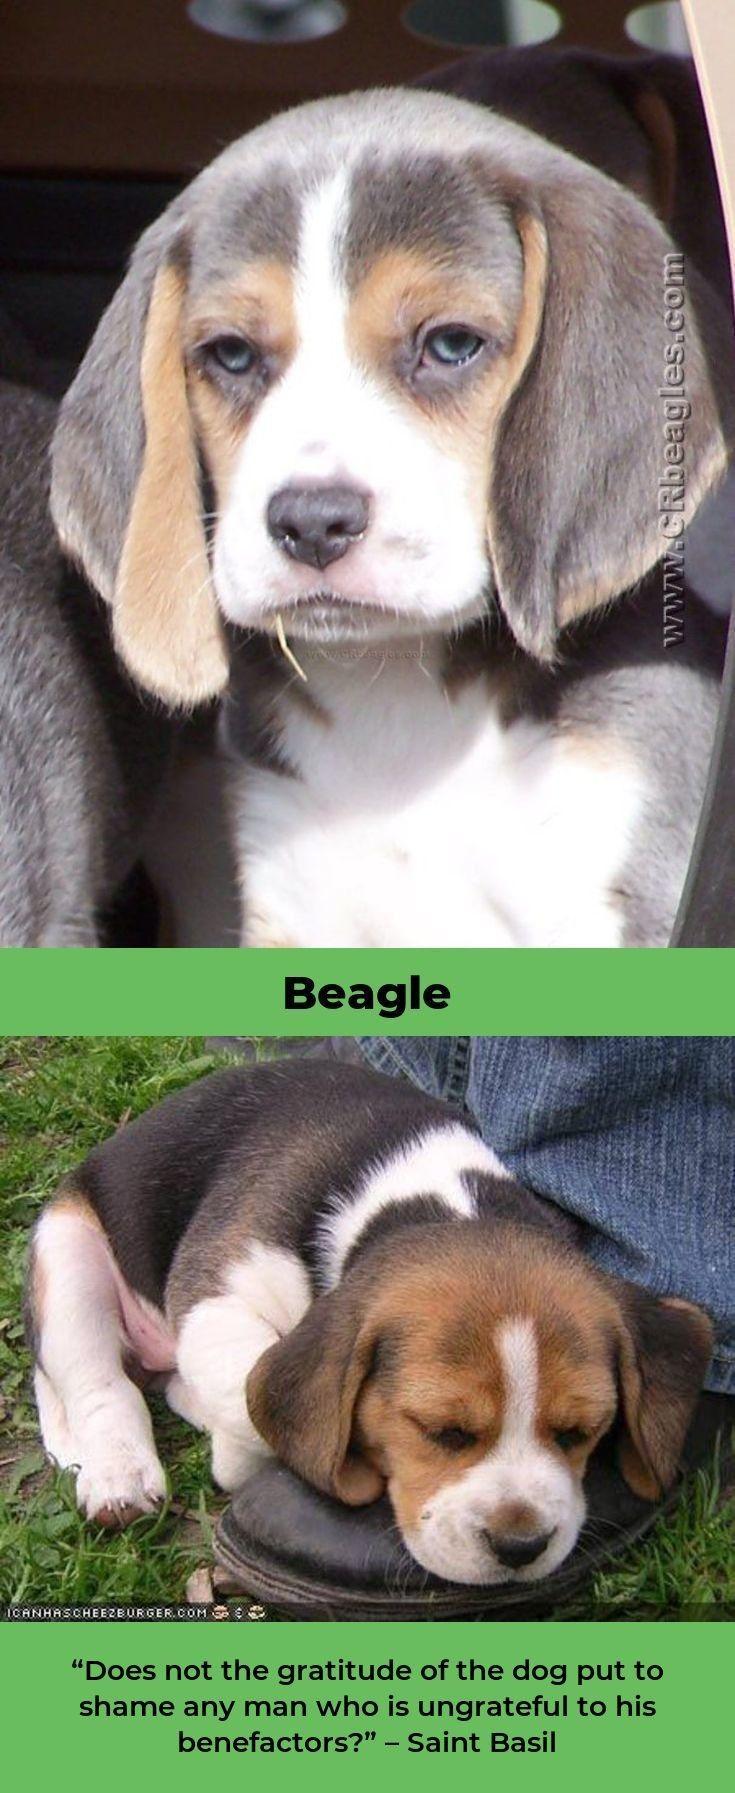 Beagle Puppy Beaglesdaily Beagles Funny Beagle Beagle Puppy